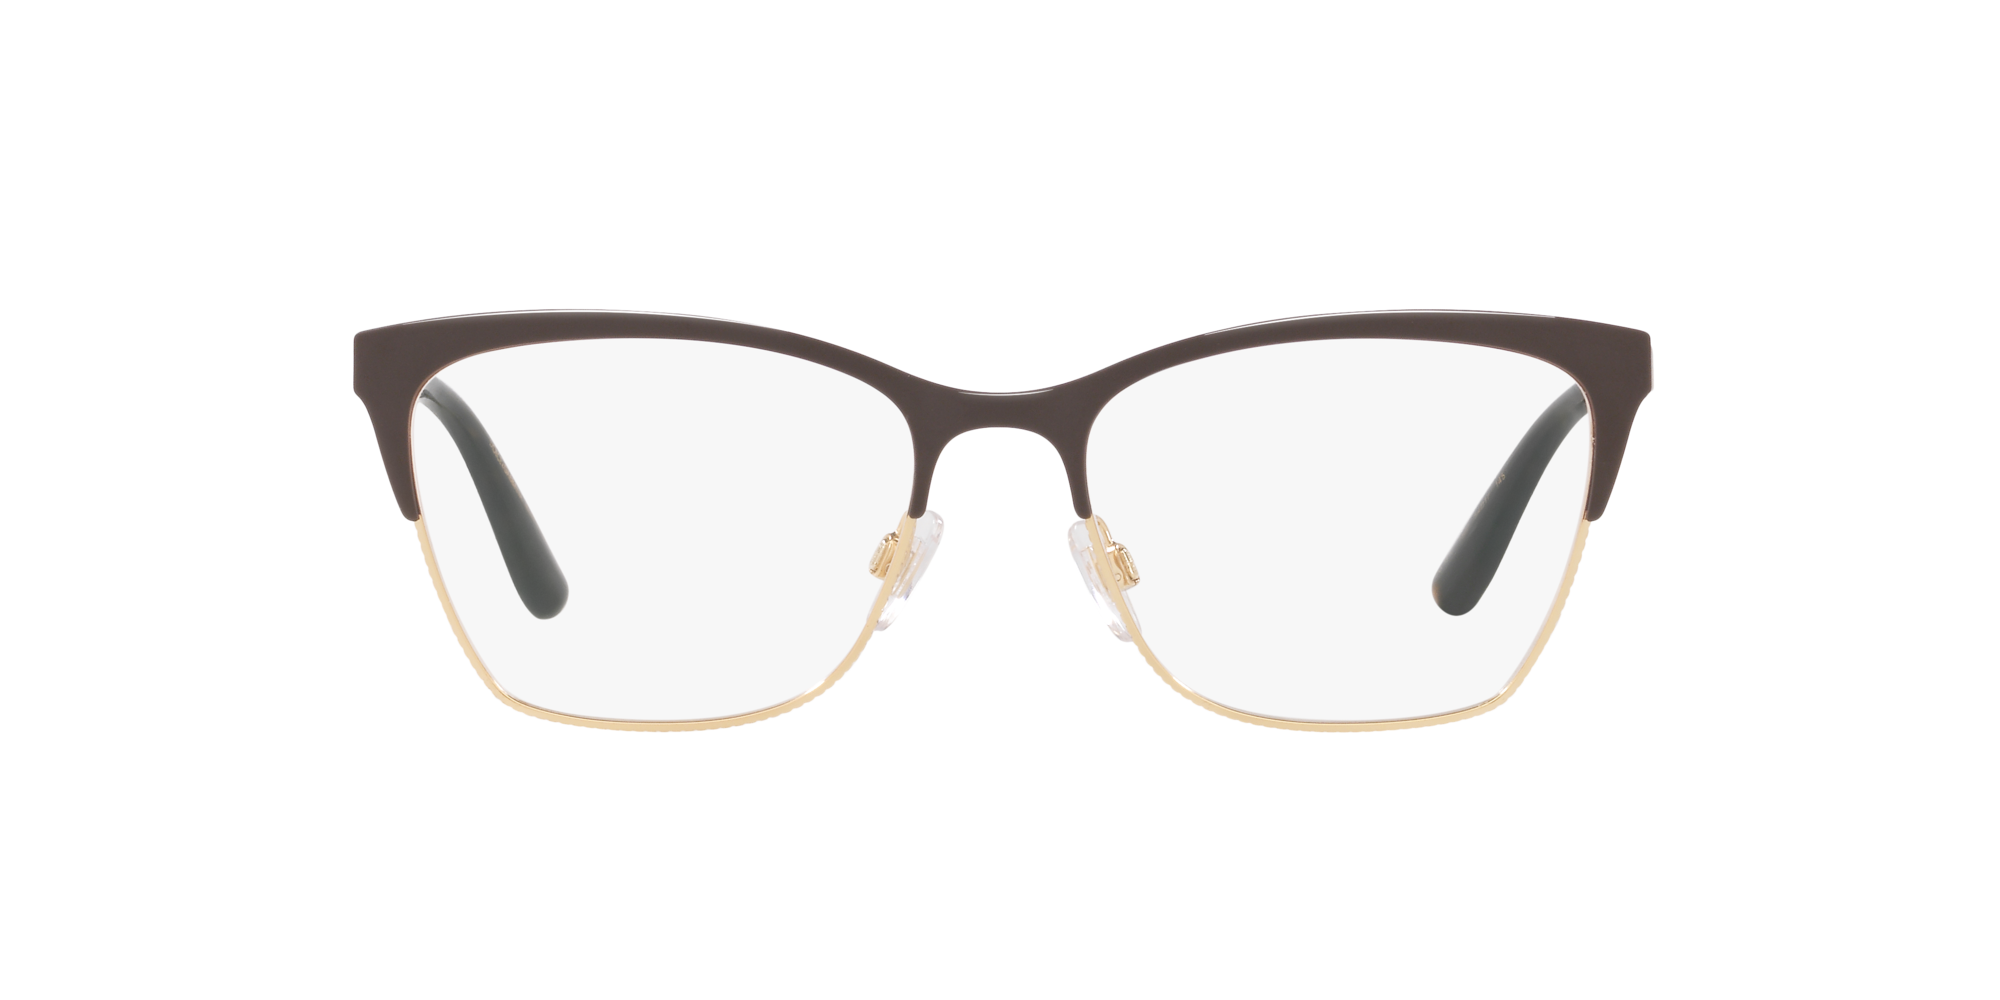 Image for DG1310 from LensCrafters | Glasses, Prescription Glasses Online, Eyewear